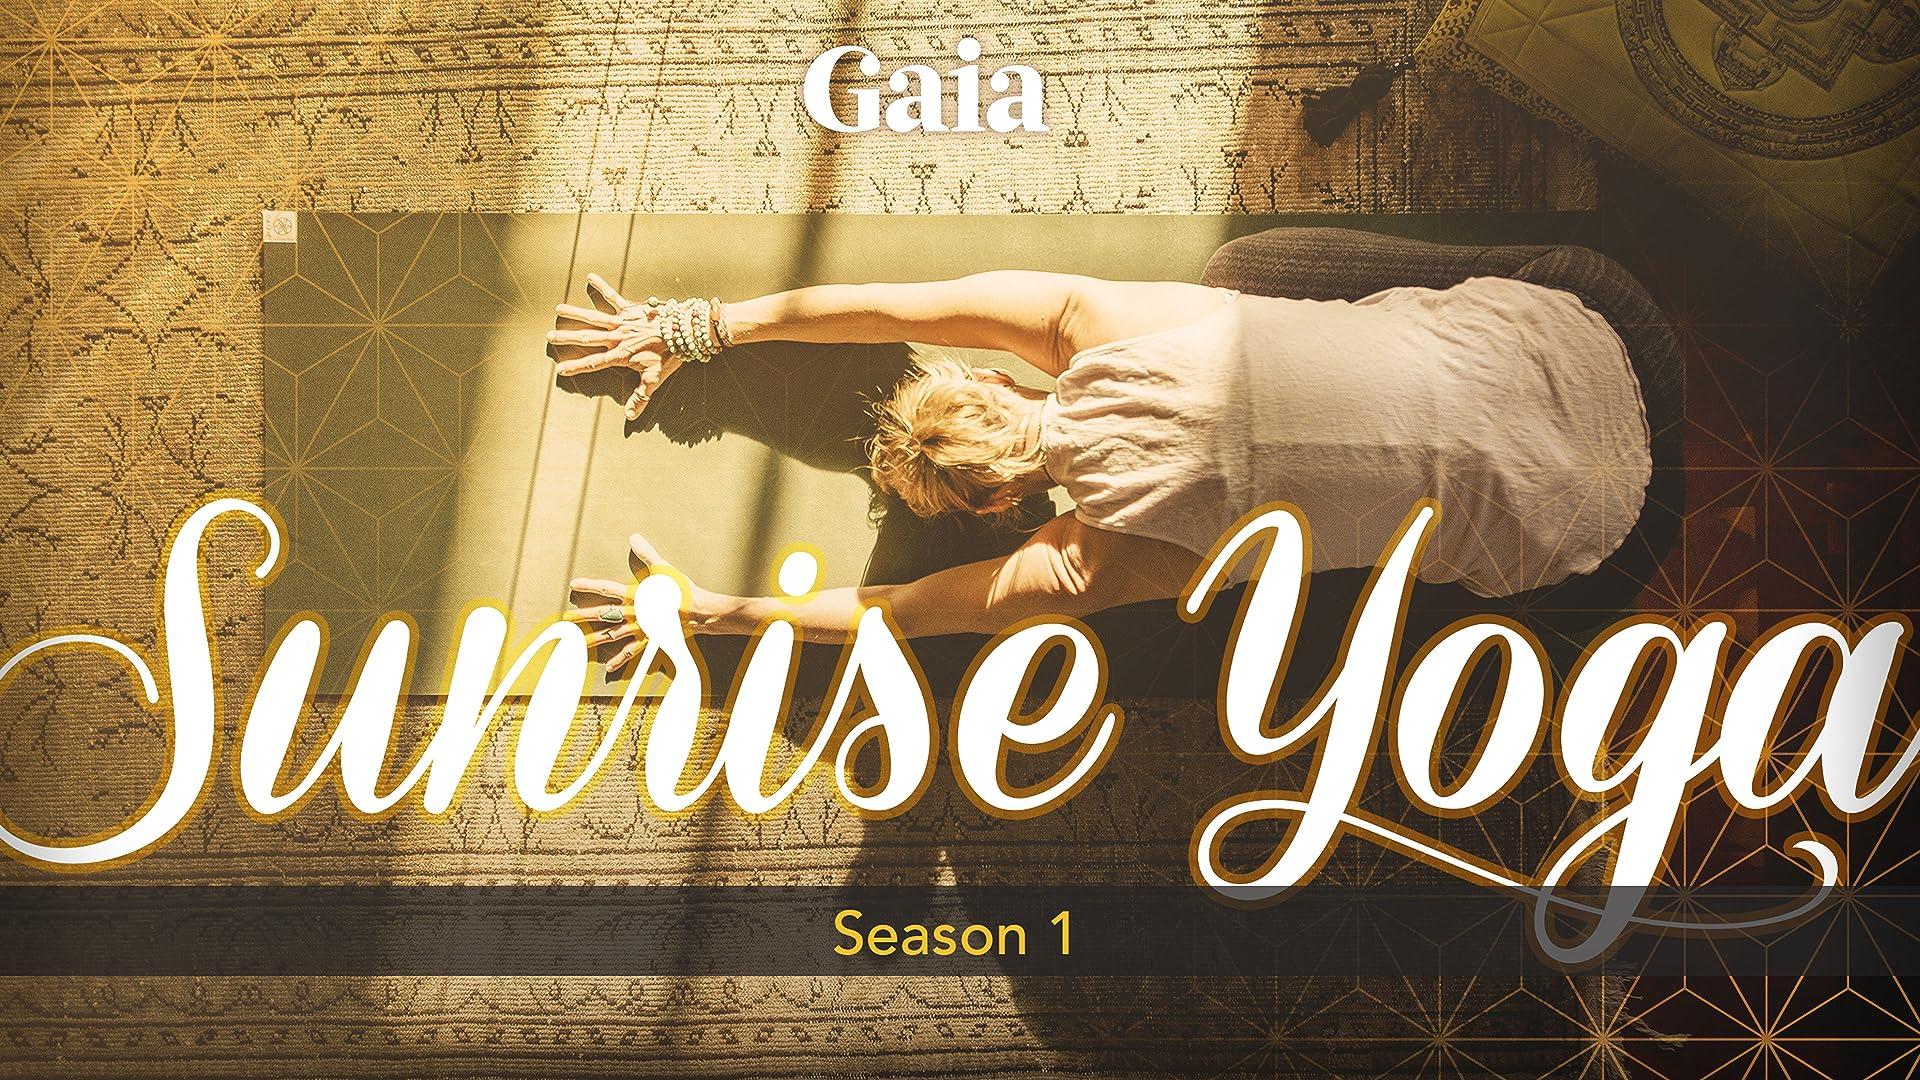 Sunrise Yoga - Season 1